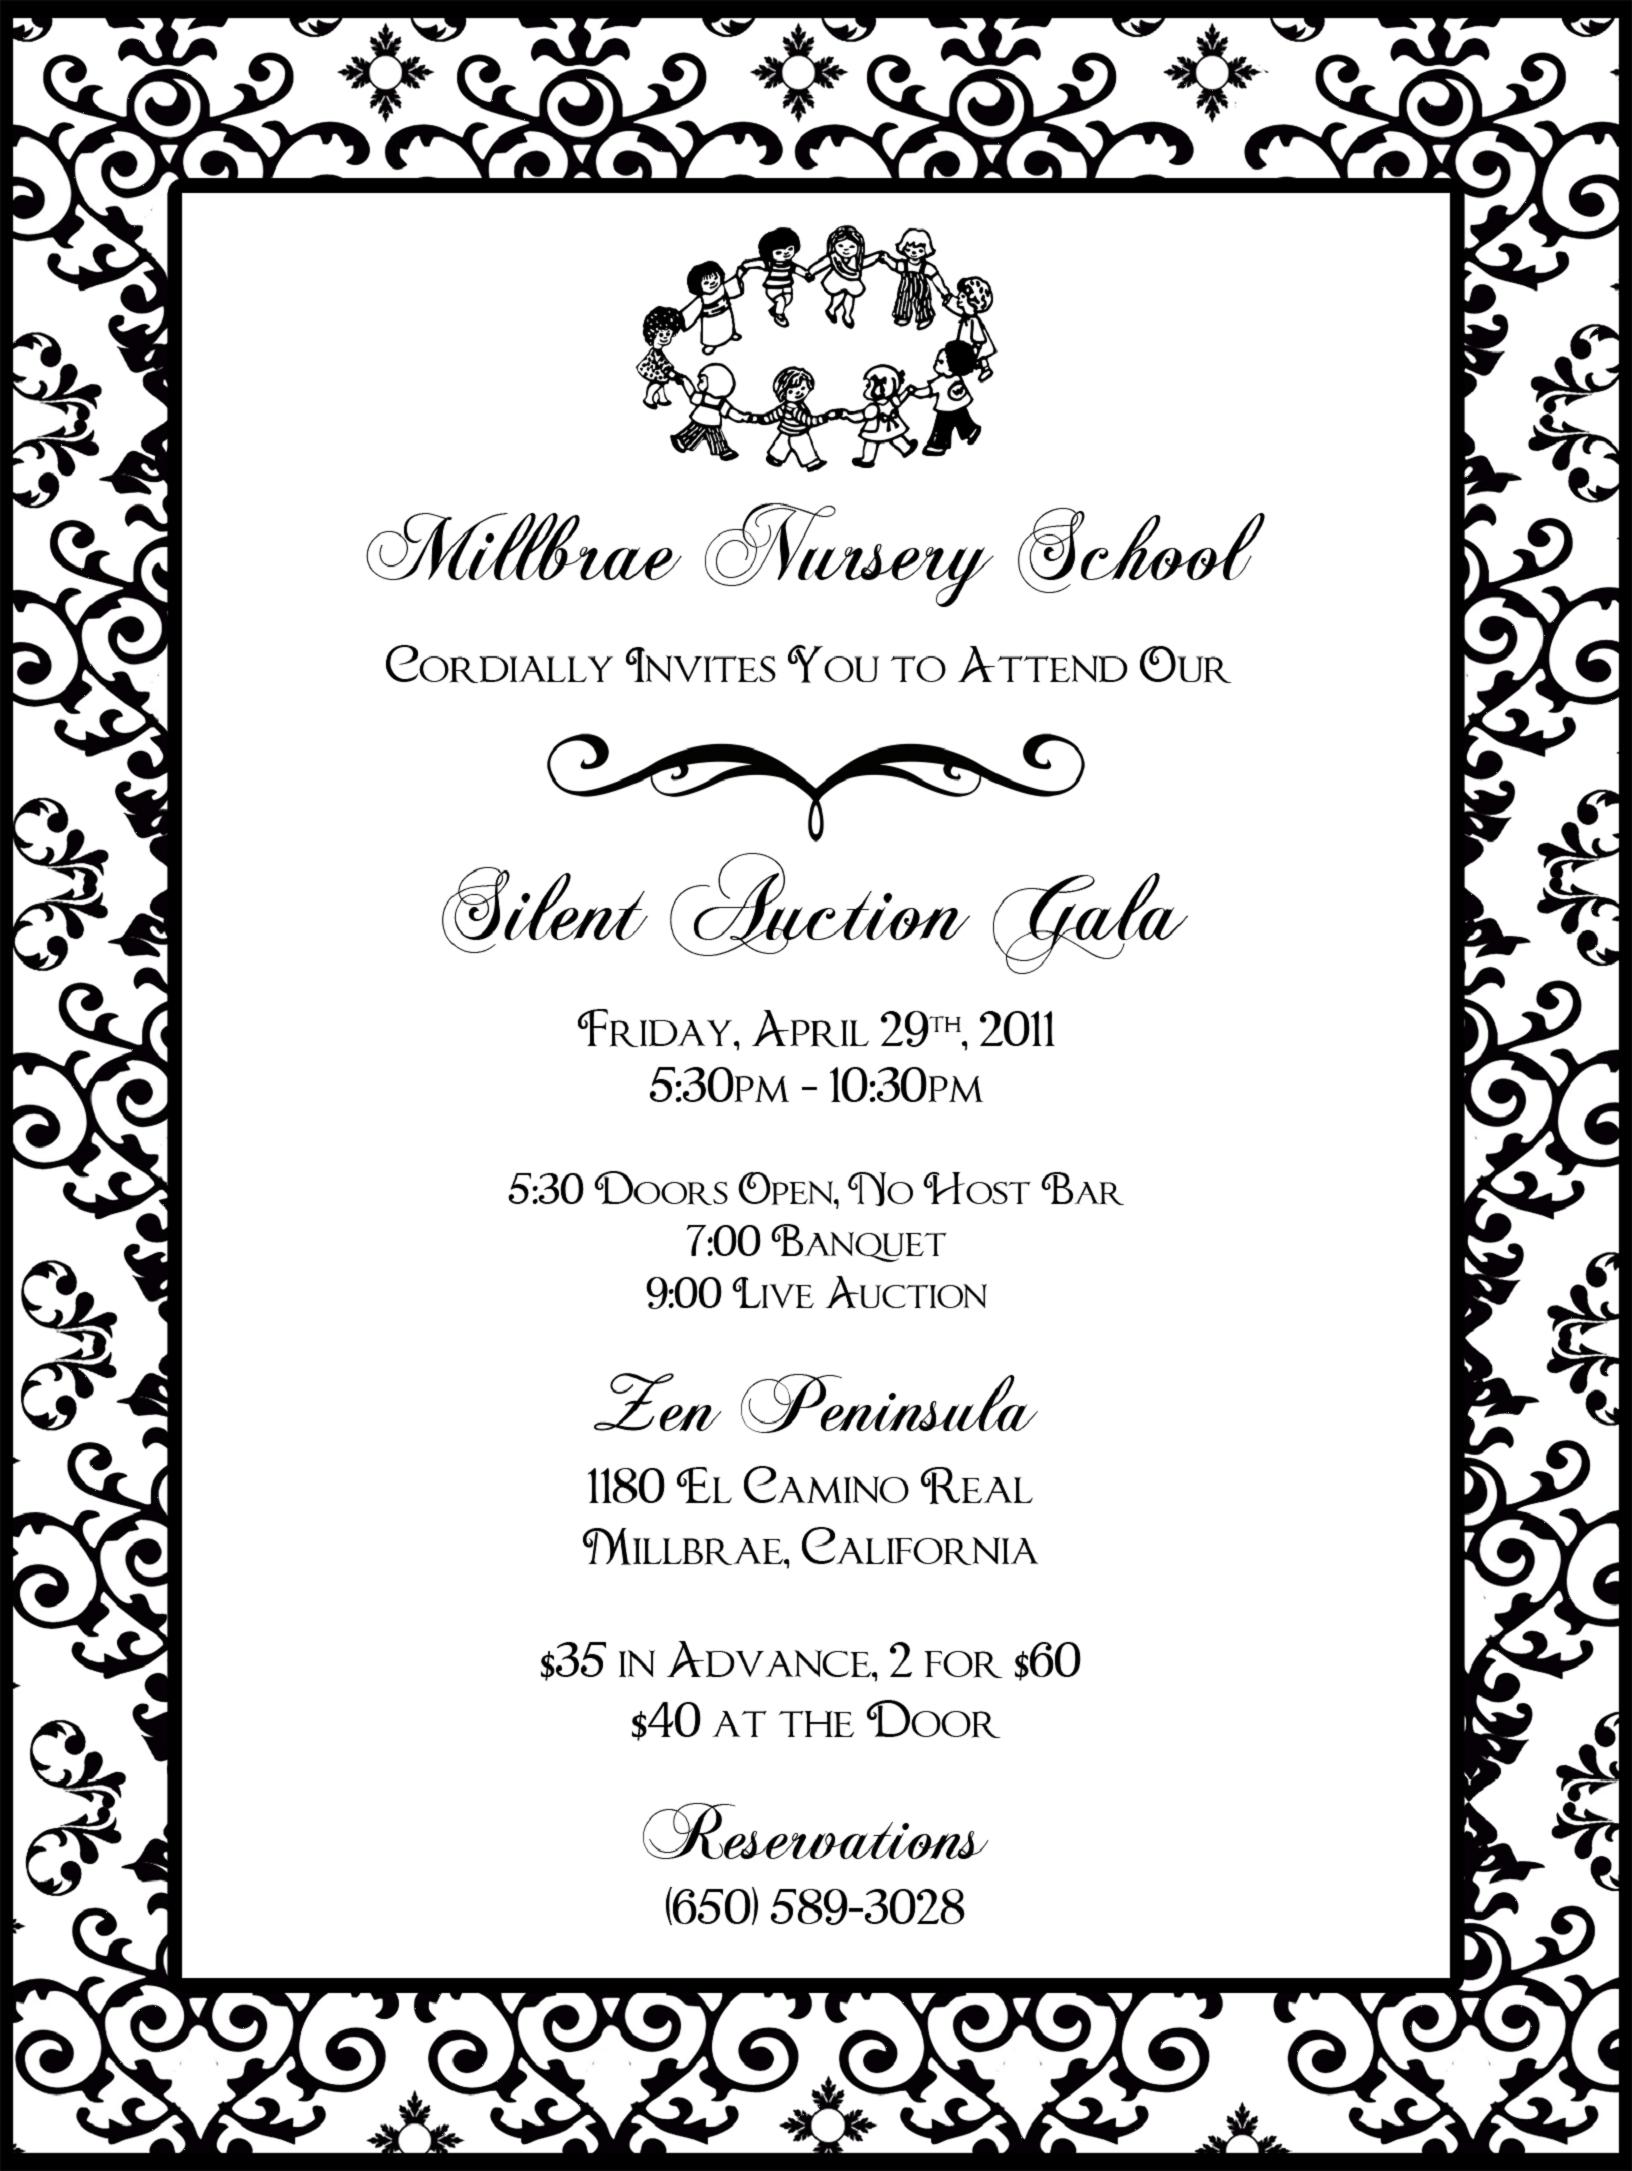 A Wonderful Event!